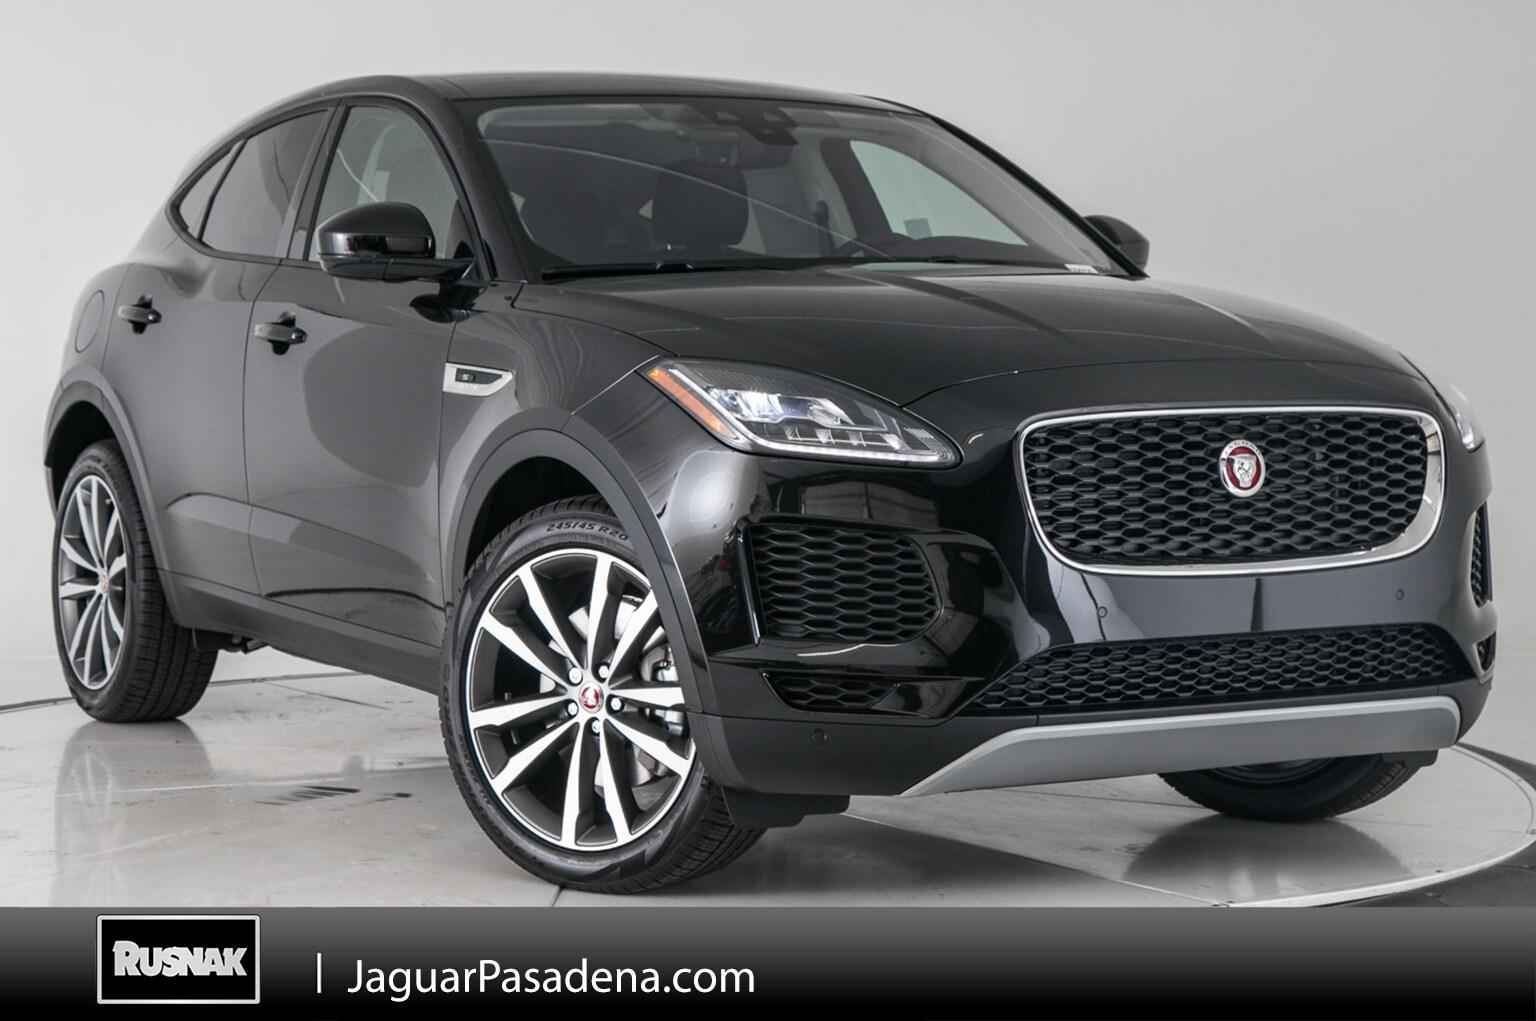 New 2019 Jaguar E-PACE S SUV For Sale Los Angeles California